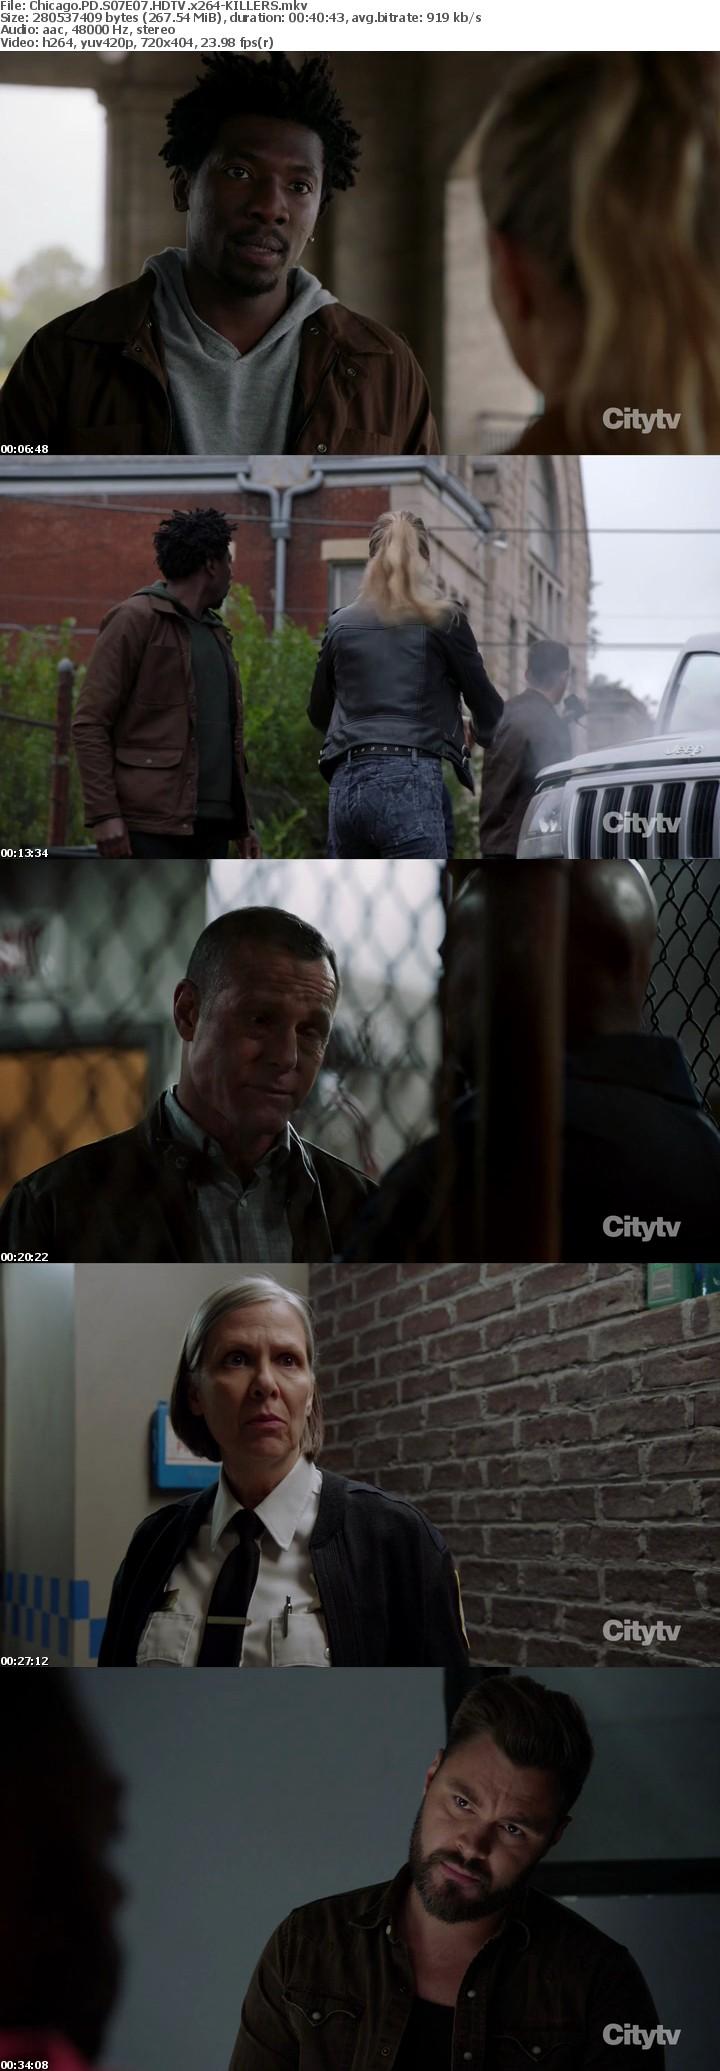 Chicago PD S07E07 HDTV x264-KILLERS